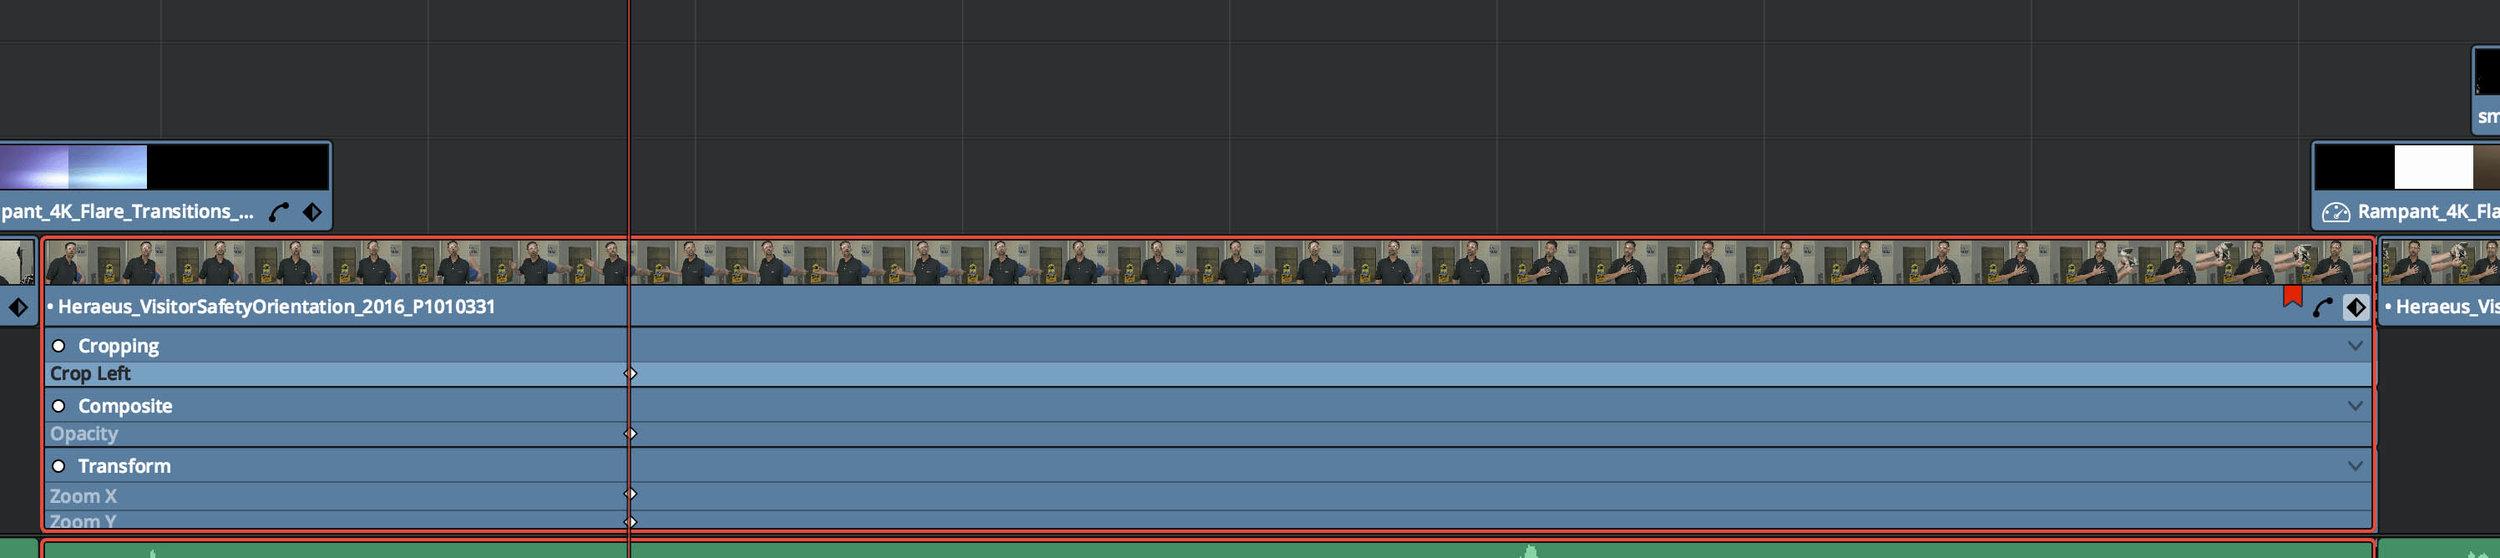 Keyframe Viewer in the Edit Panel Timeline